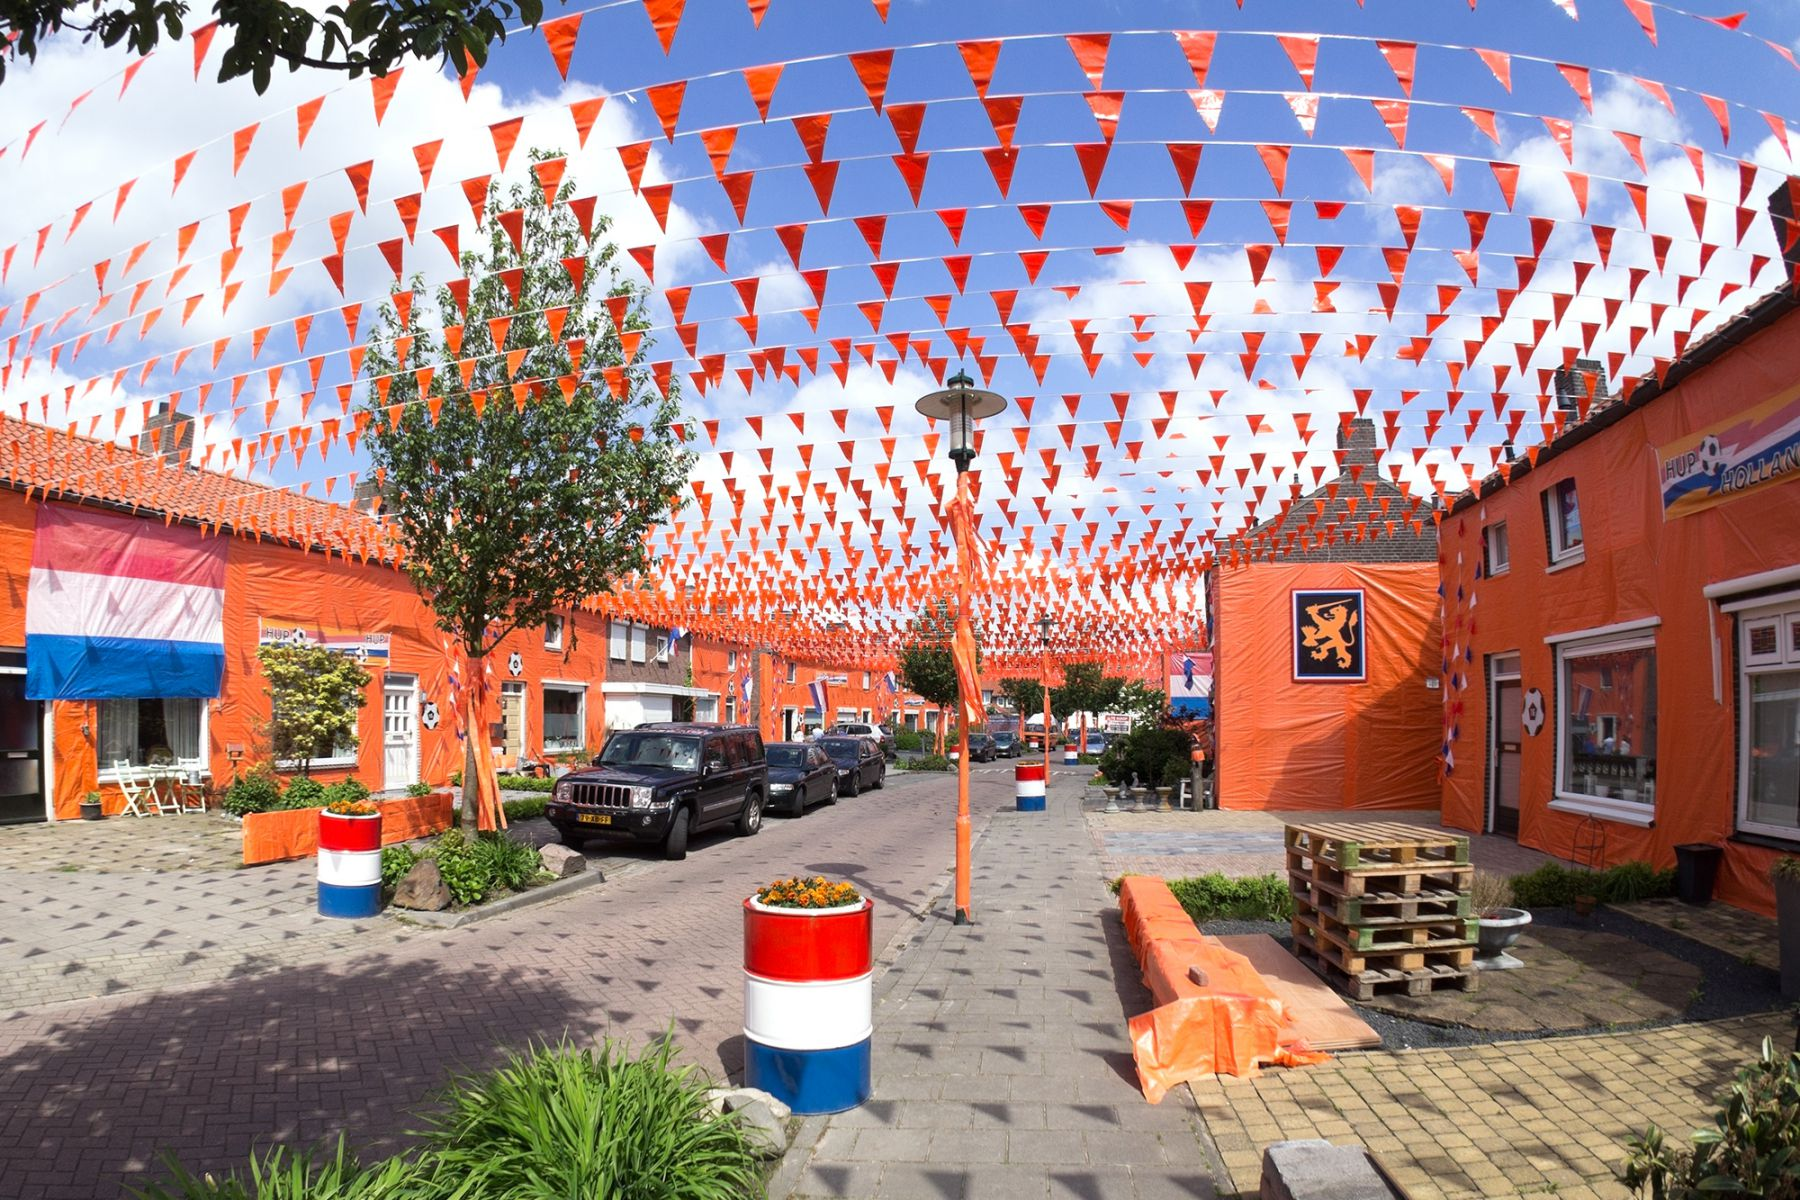 Oranjestraat in Goirle